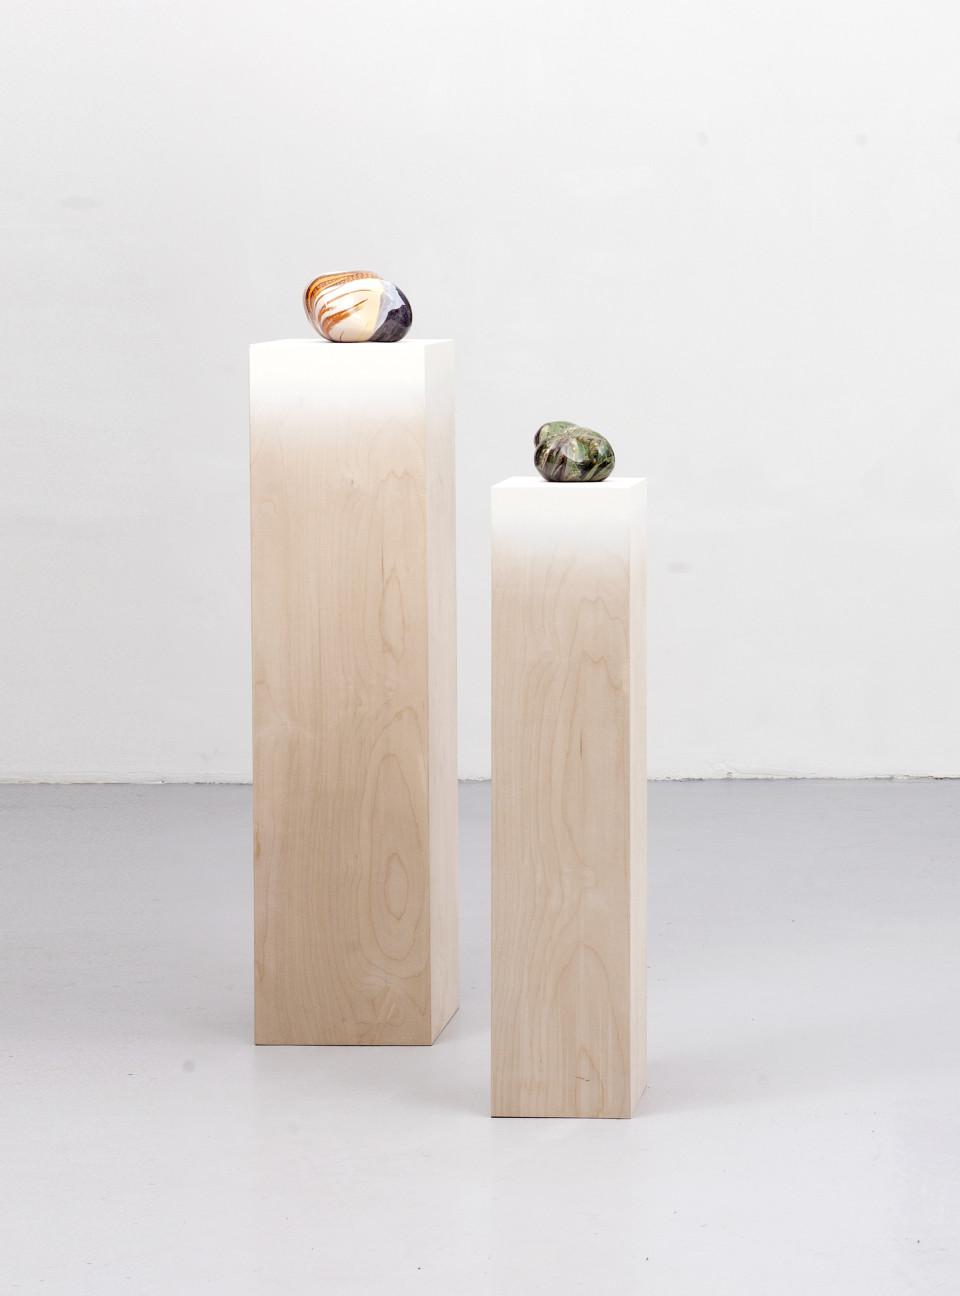 4K Ultra HD, Sculptural Landscape, Gallery Noua, Bodø, Norway, 2019.